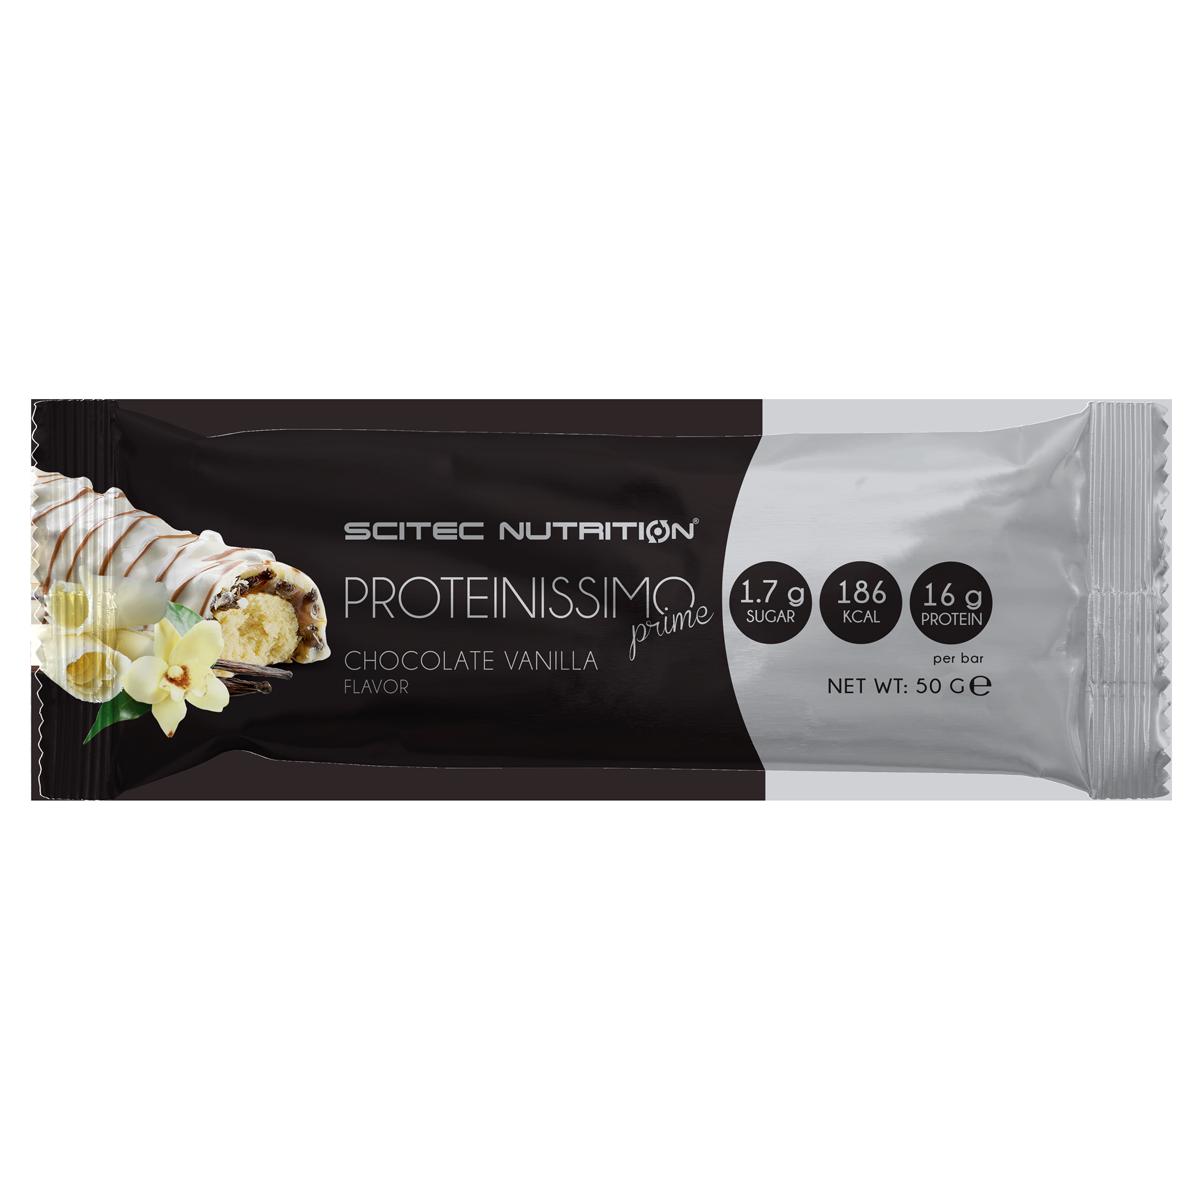 Scitec Nutrition Proteinissimo Prime 50 gr.